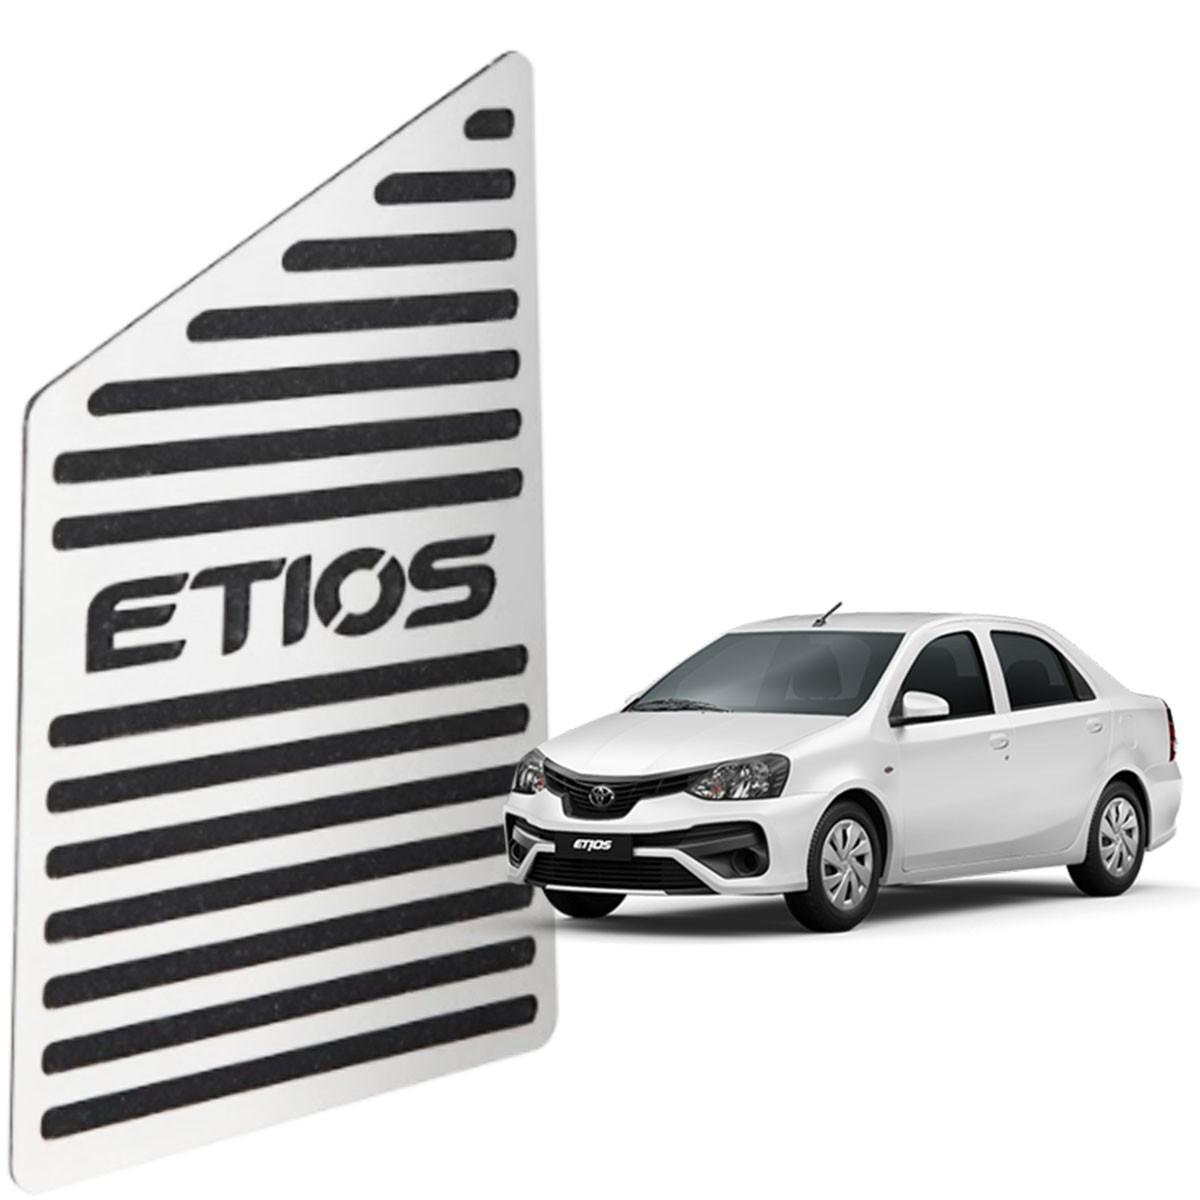 Descanso de Pé Toyota Etios Aço Inox Escovado